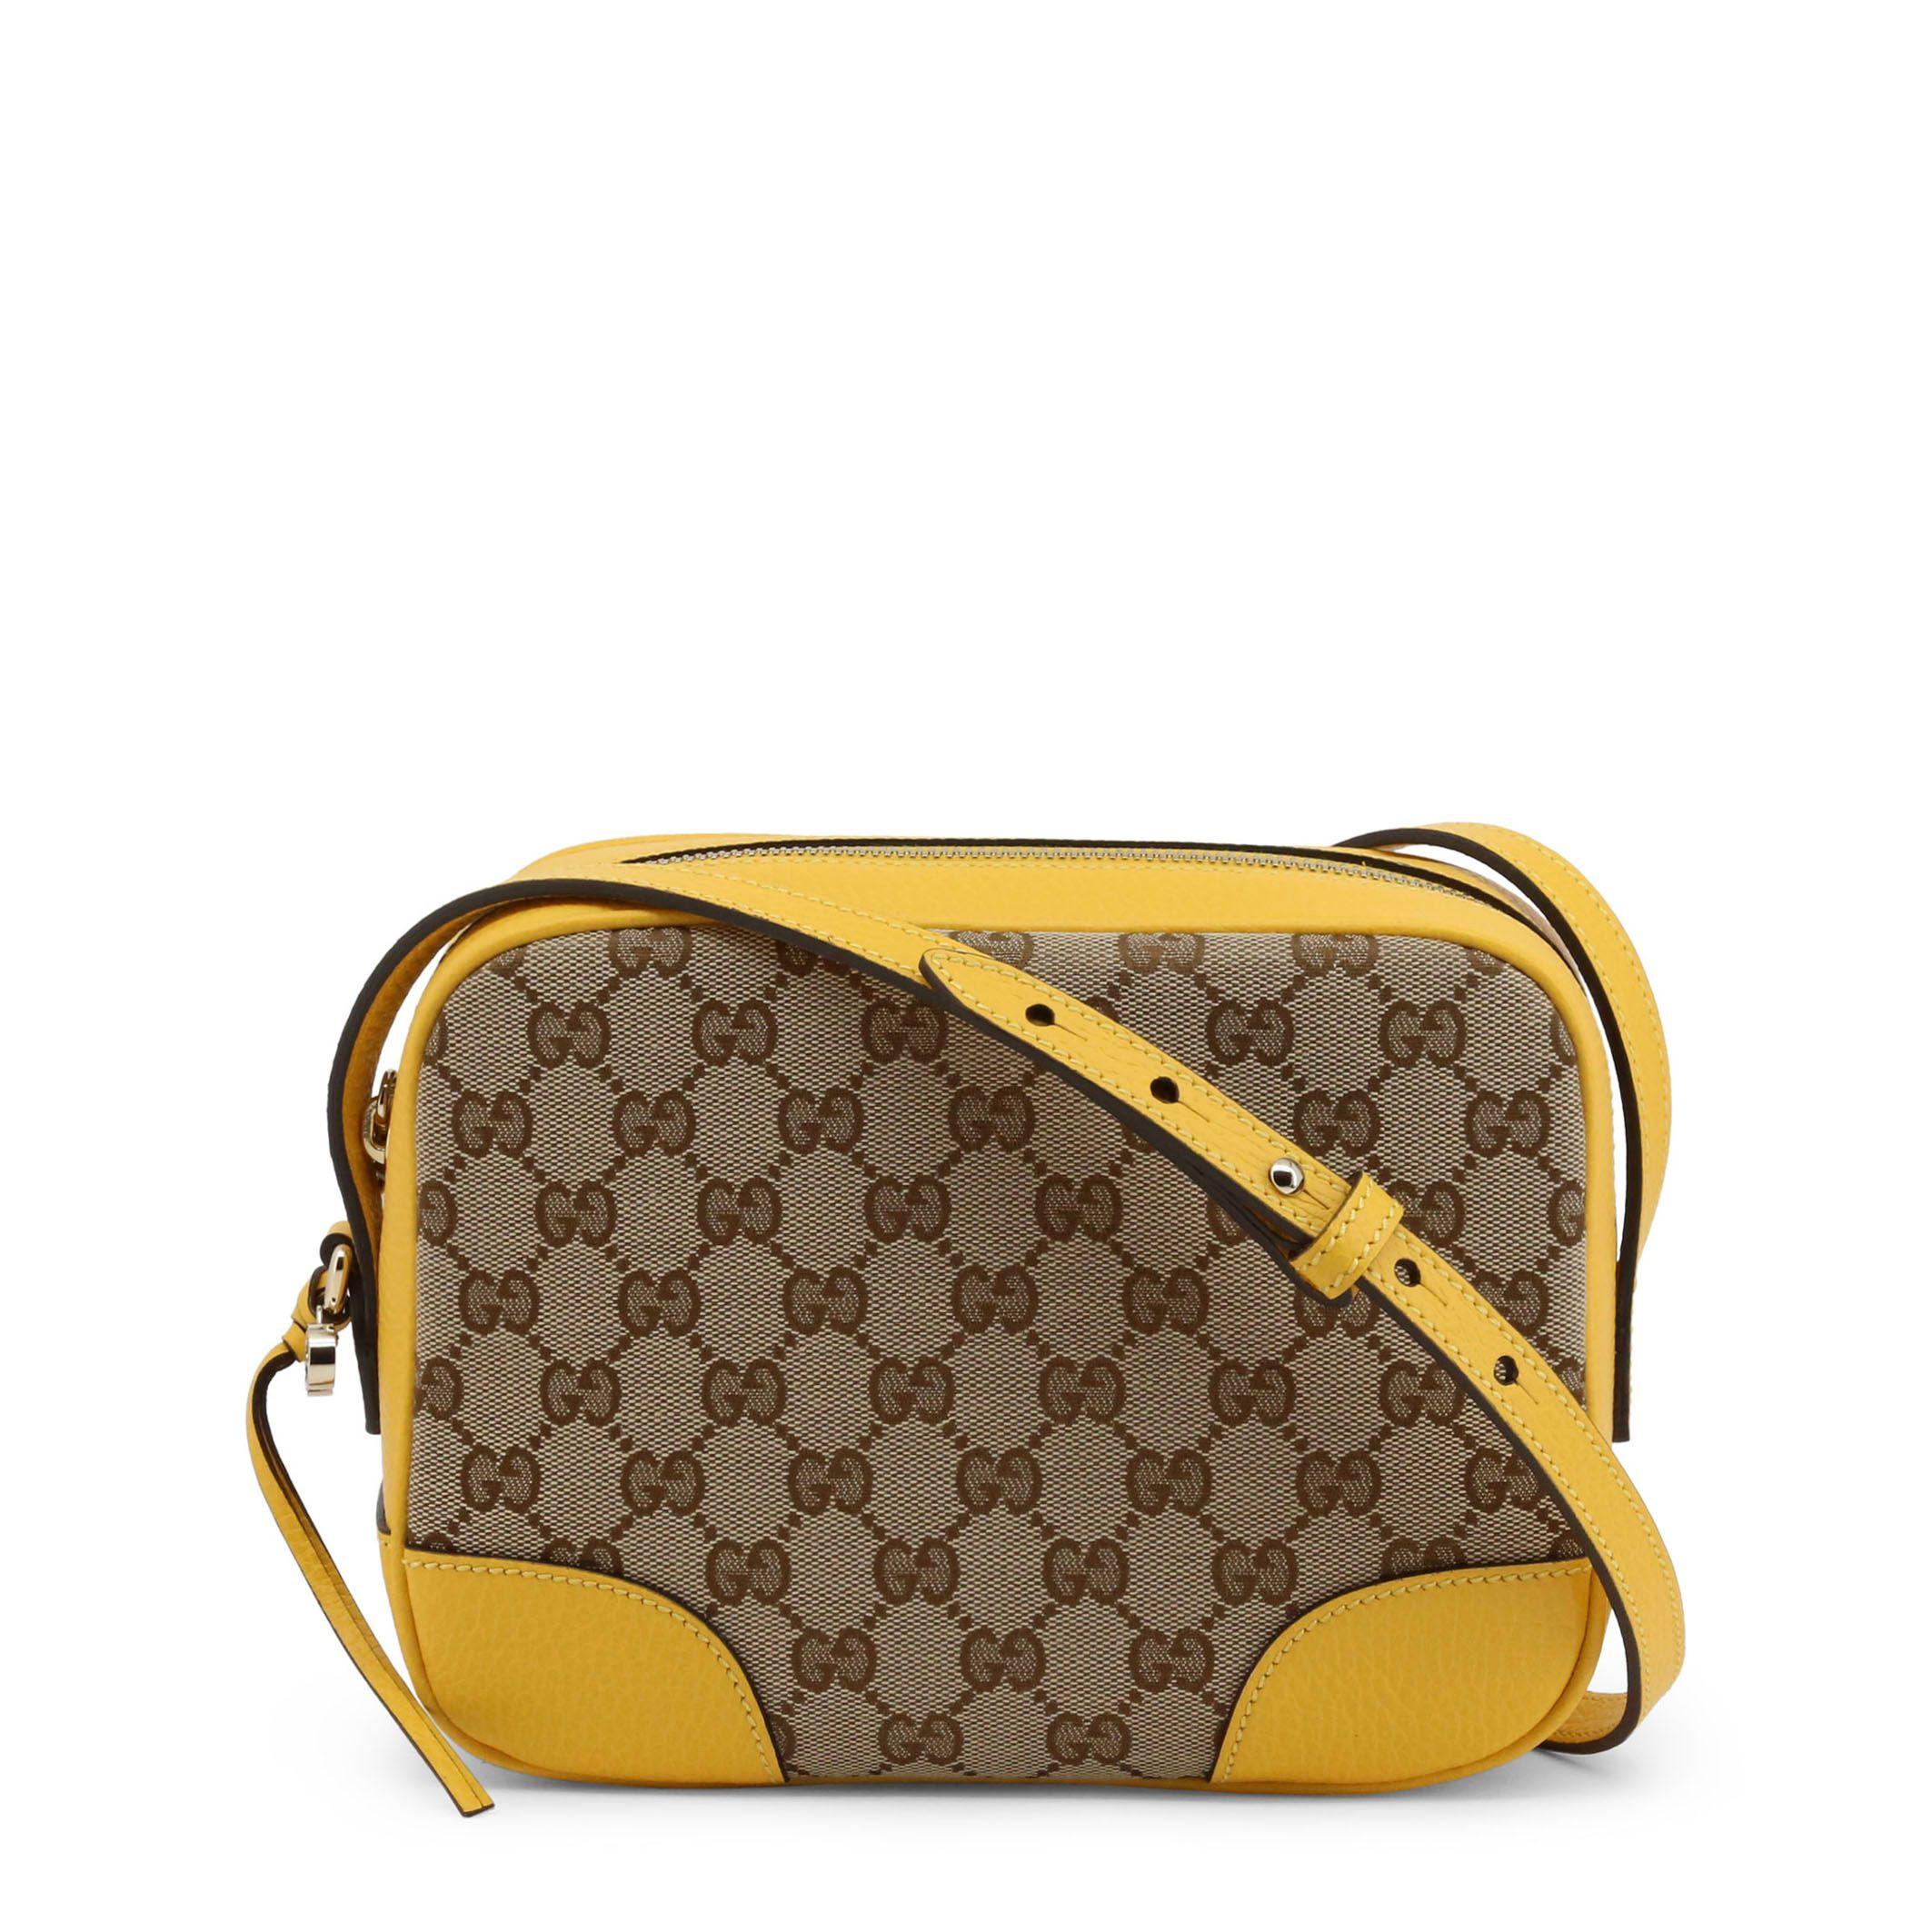 Gucci – 449413_KY9LG – Bruin Designeritems.nl